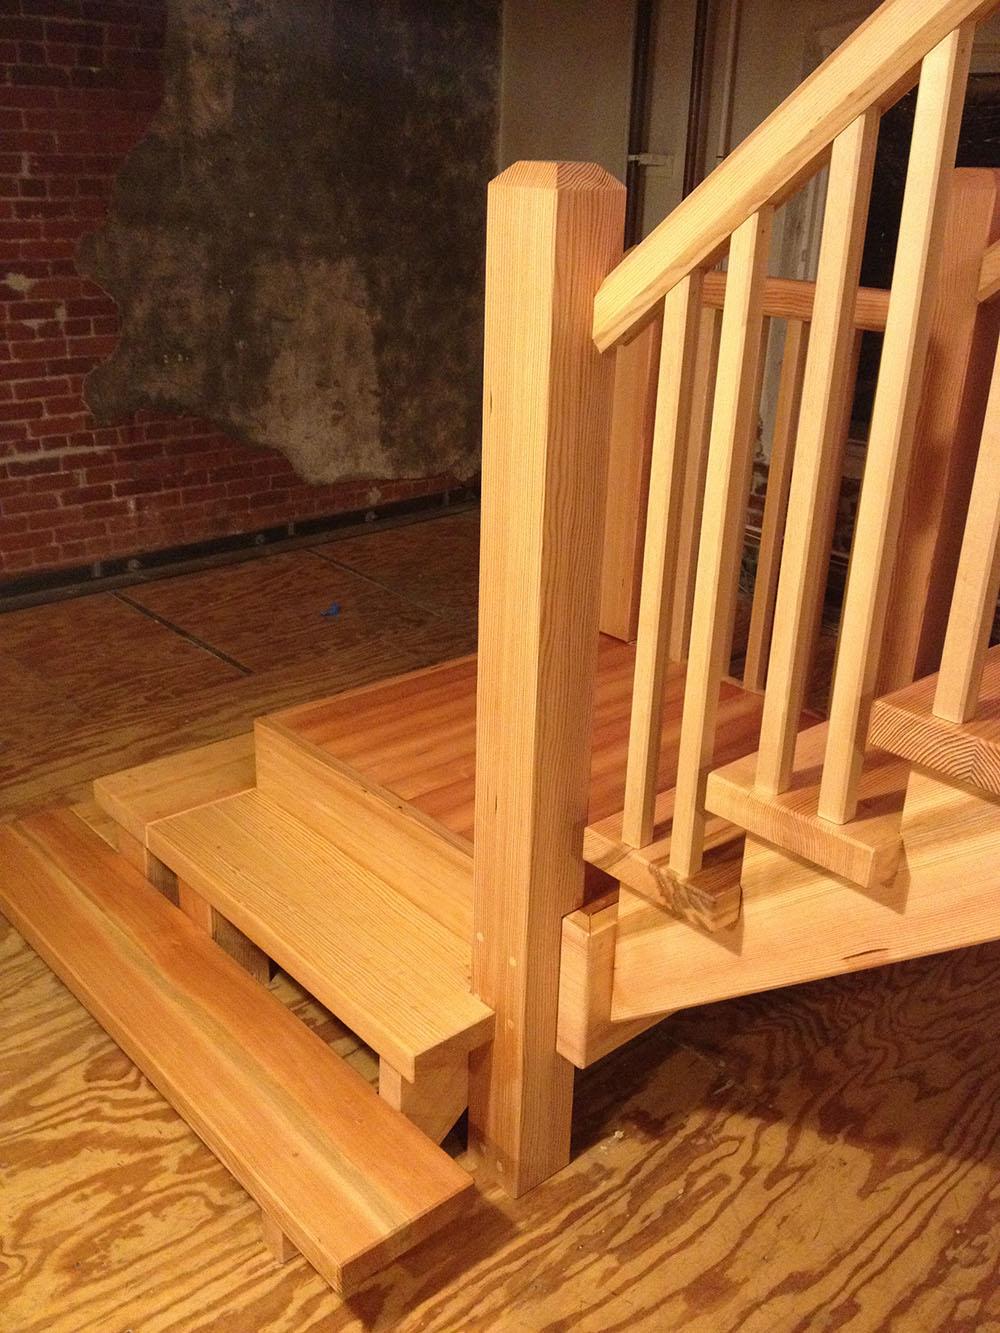 Bryant-St.-Stairs-Kevin-P-Clarke0010.jpg